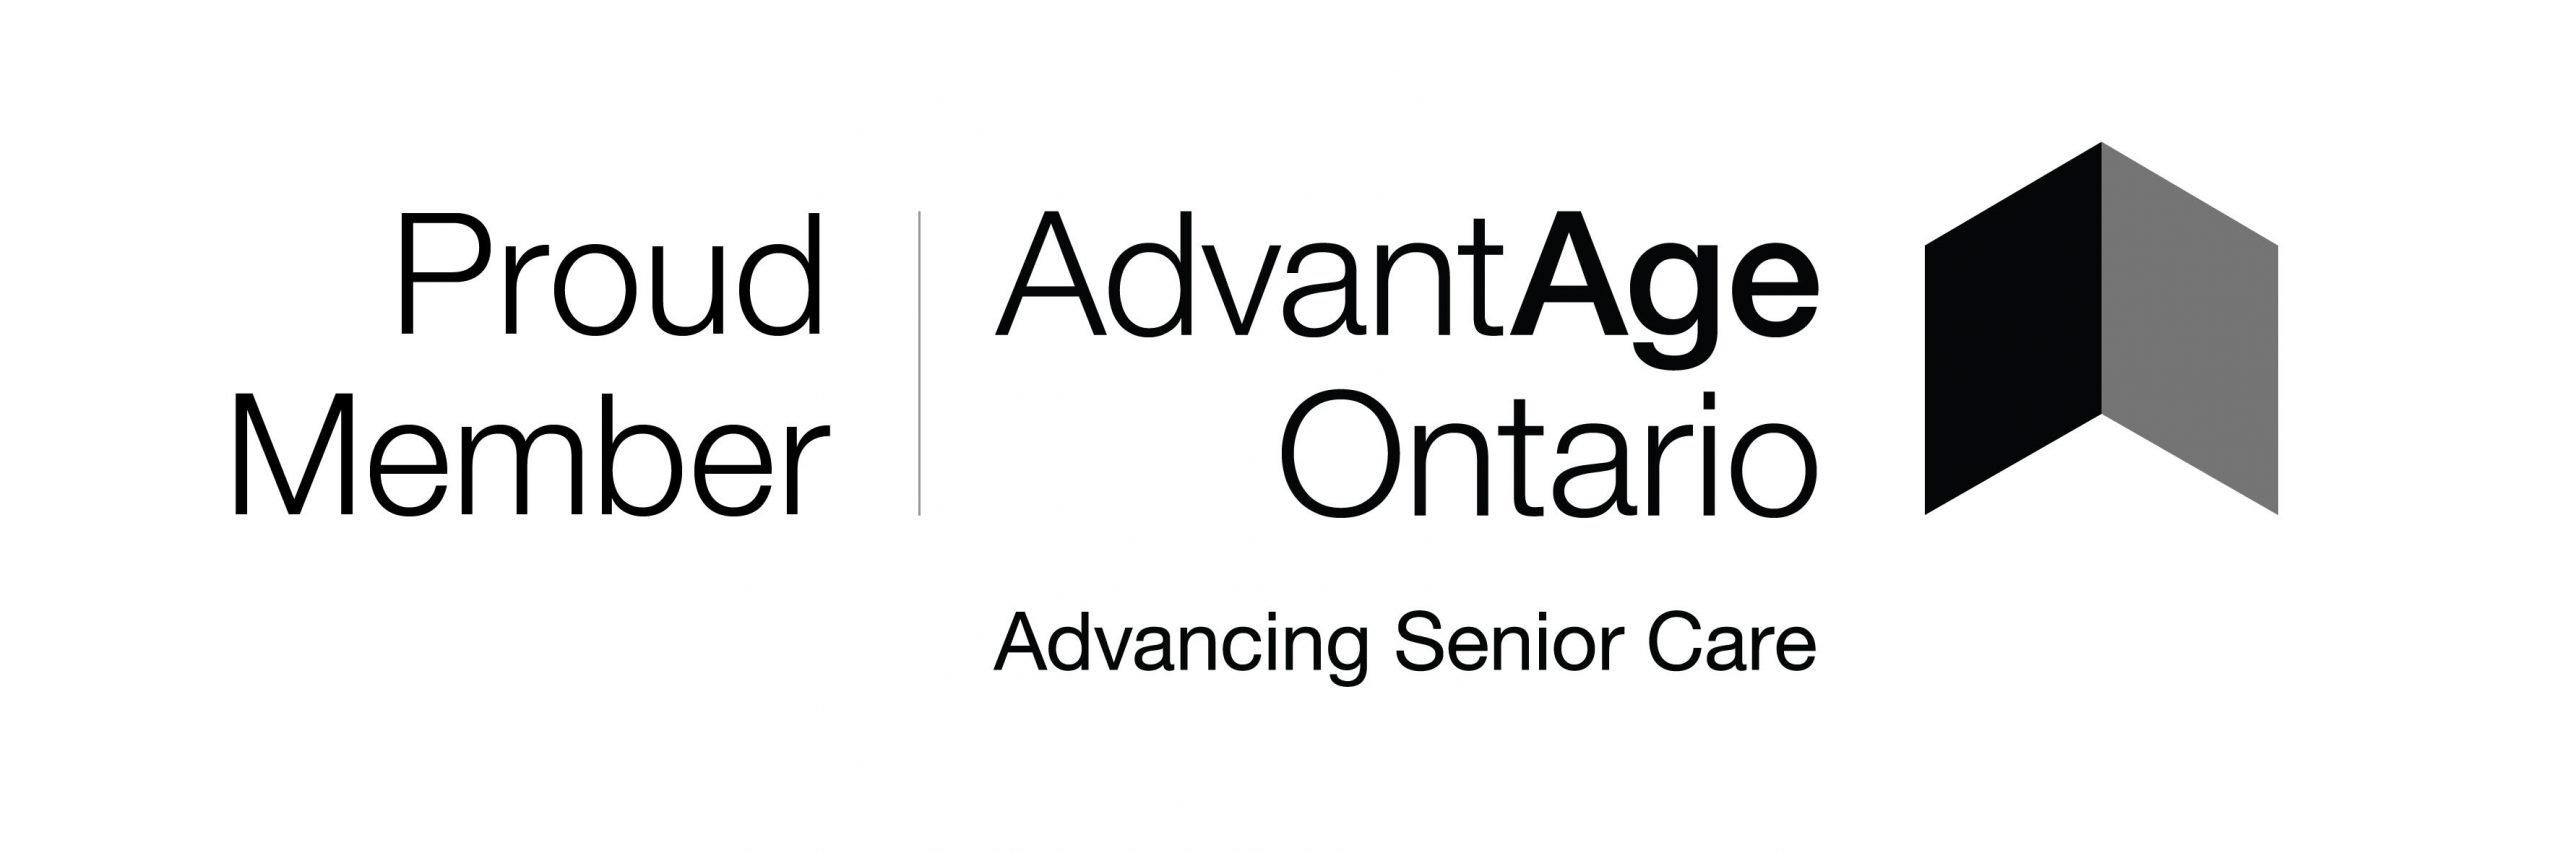 AdvantAge Ontario